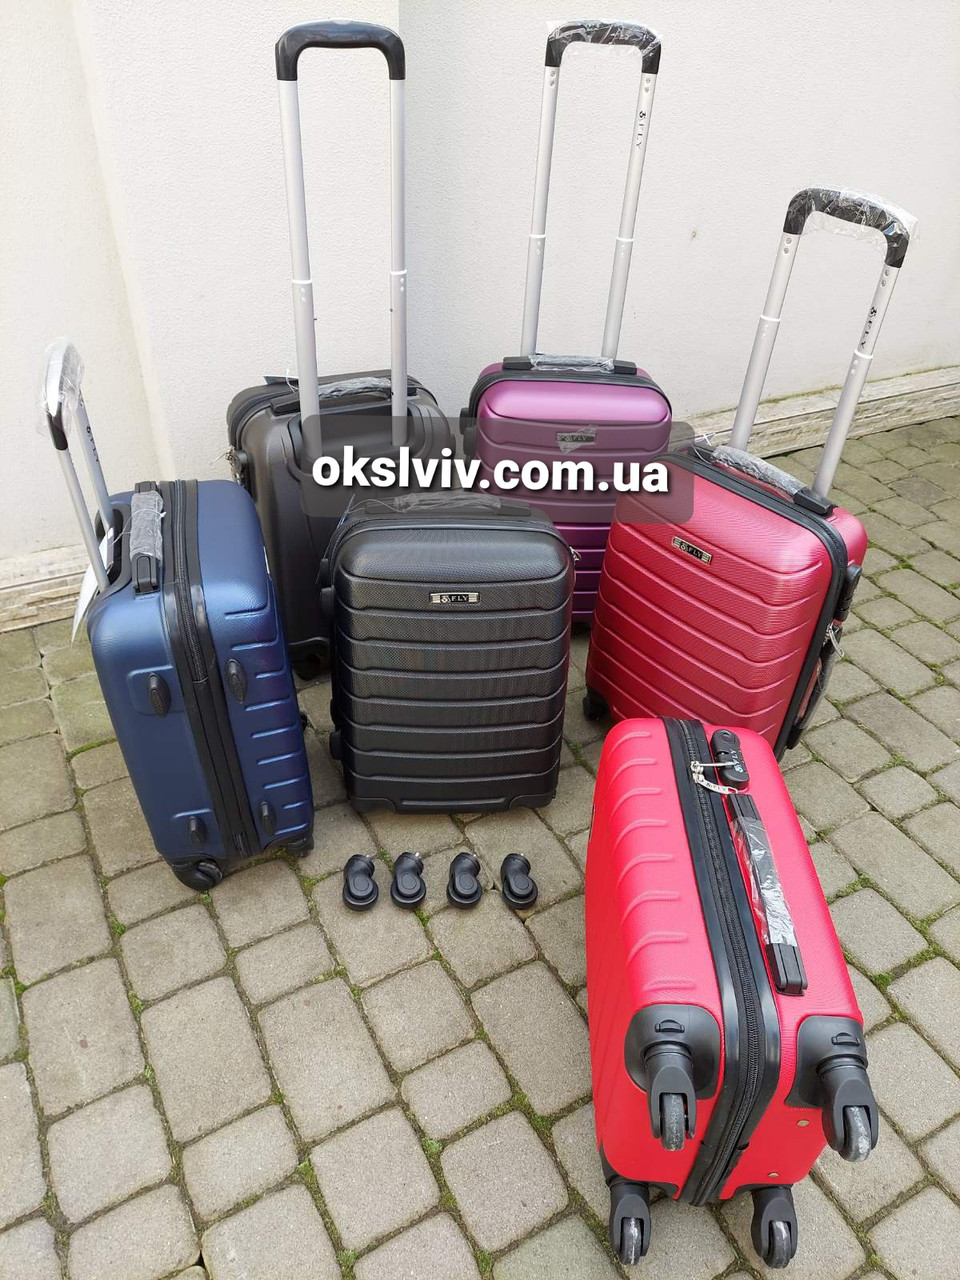 FLY 1107 Польща валізи чемодани ручна поклажа сумки на колесах